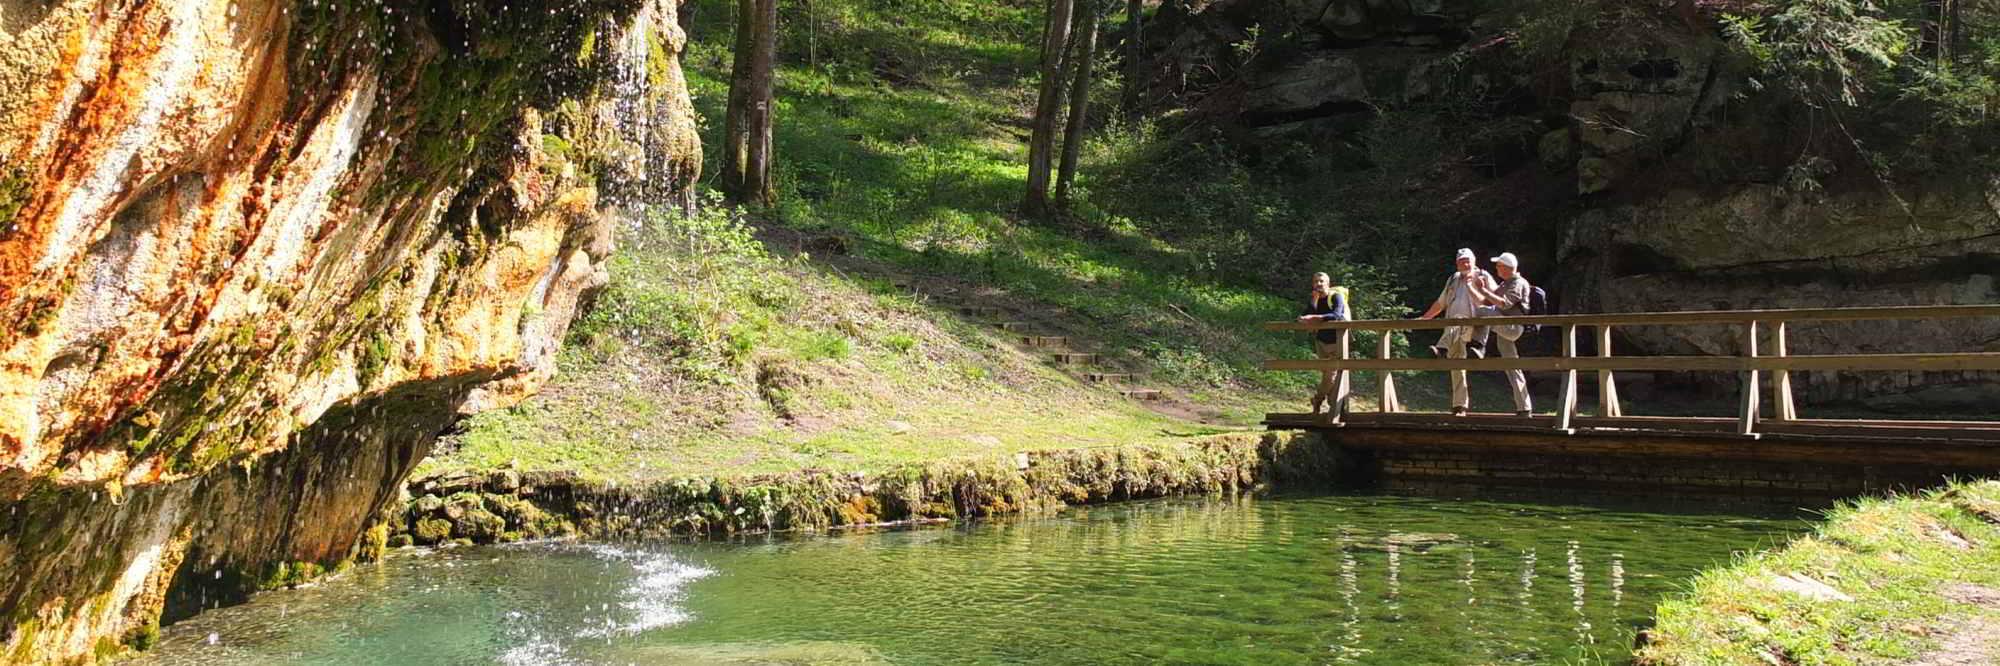 Mullerthal Trail headerfoto